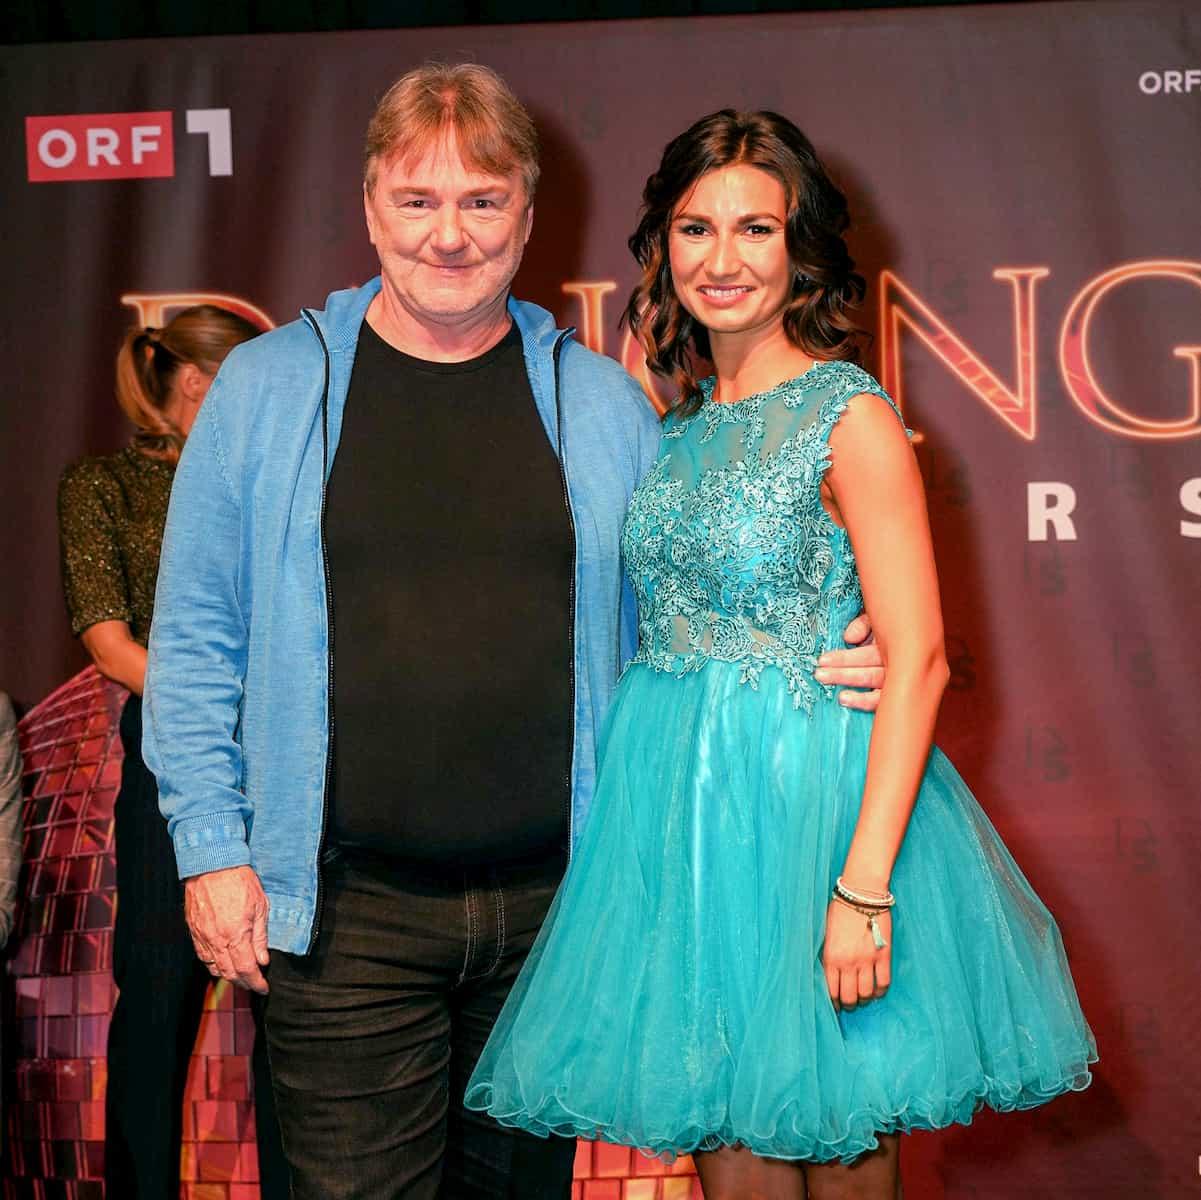 Andreas Ogris - Vesela Dimova als Tanzpaar bei den DancingStars 2020 dabei